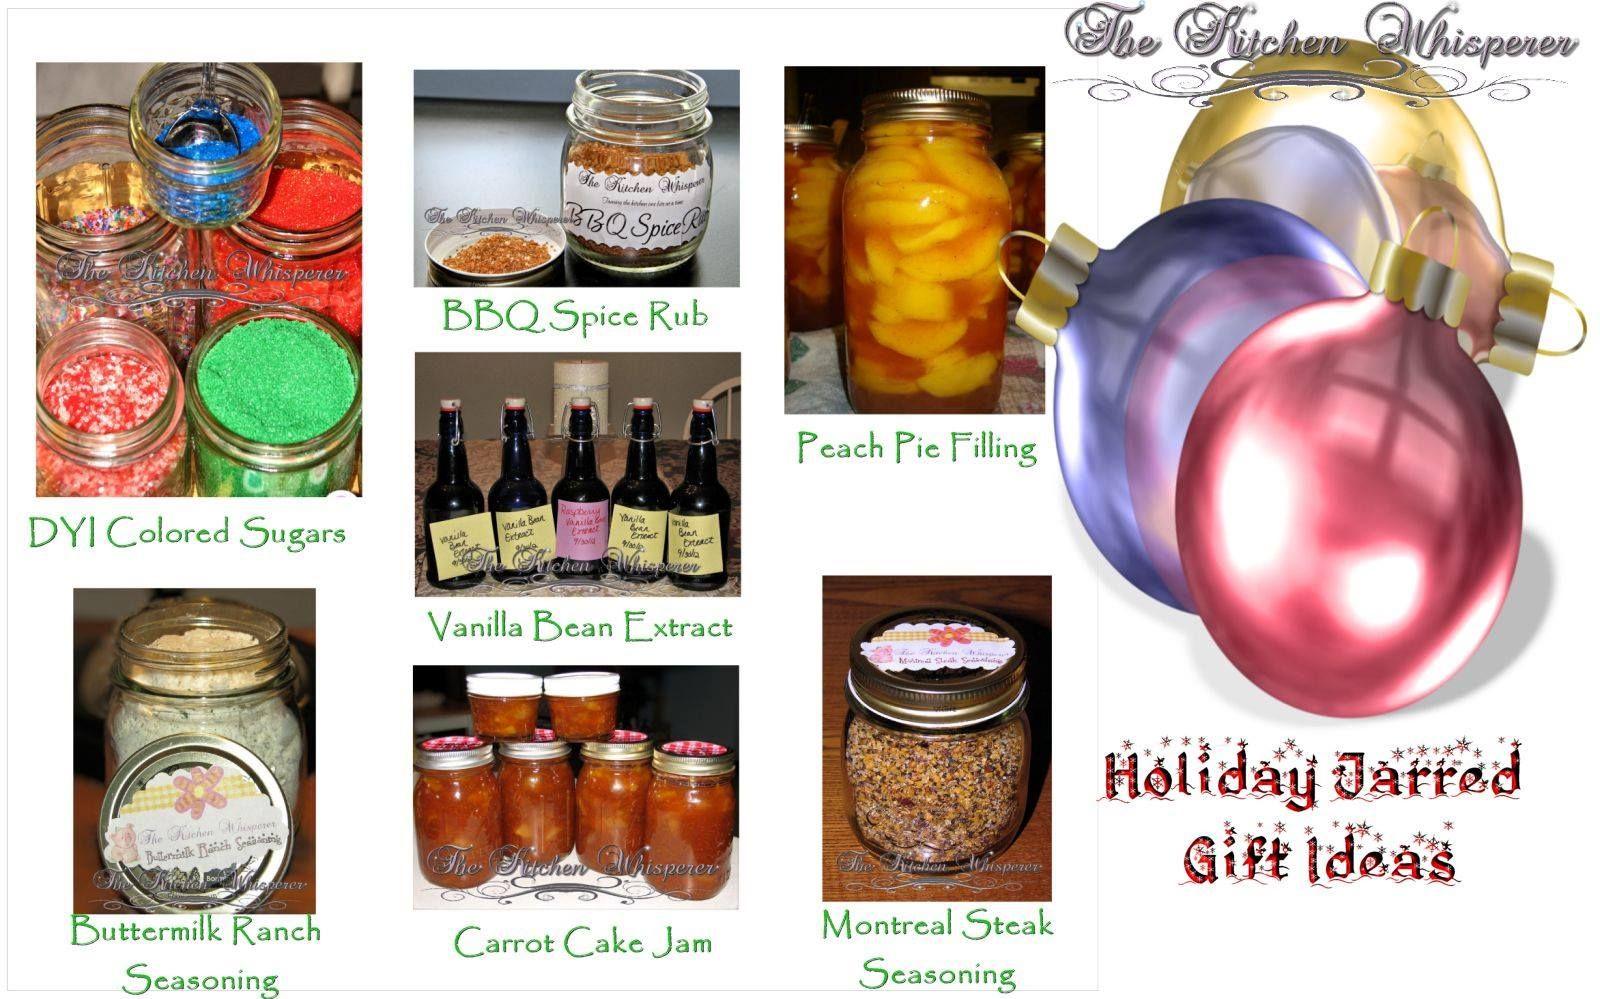 Jarred christmas gift ideas